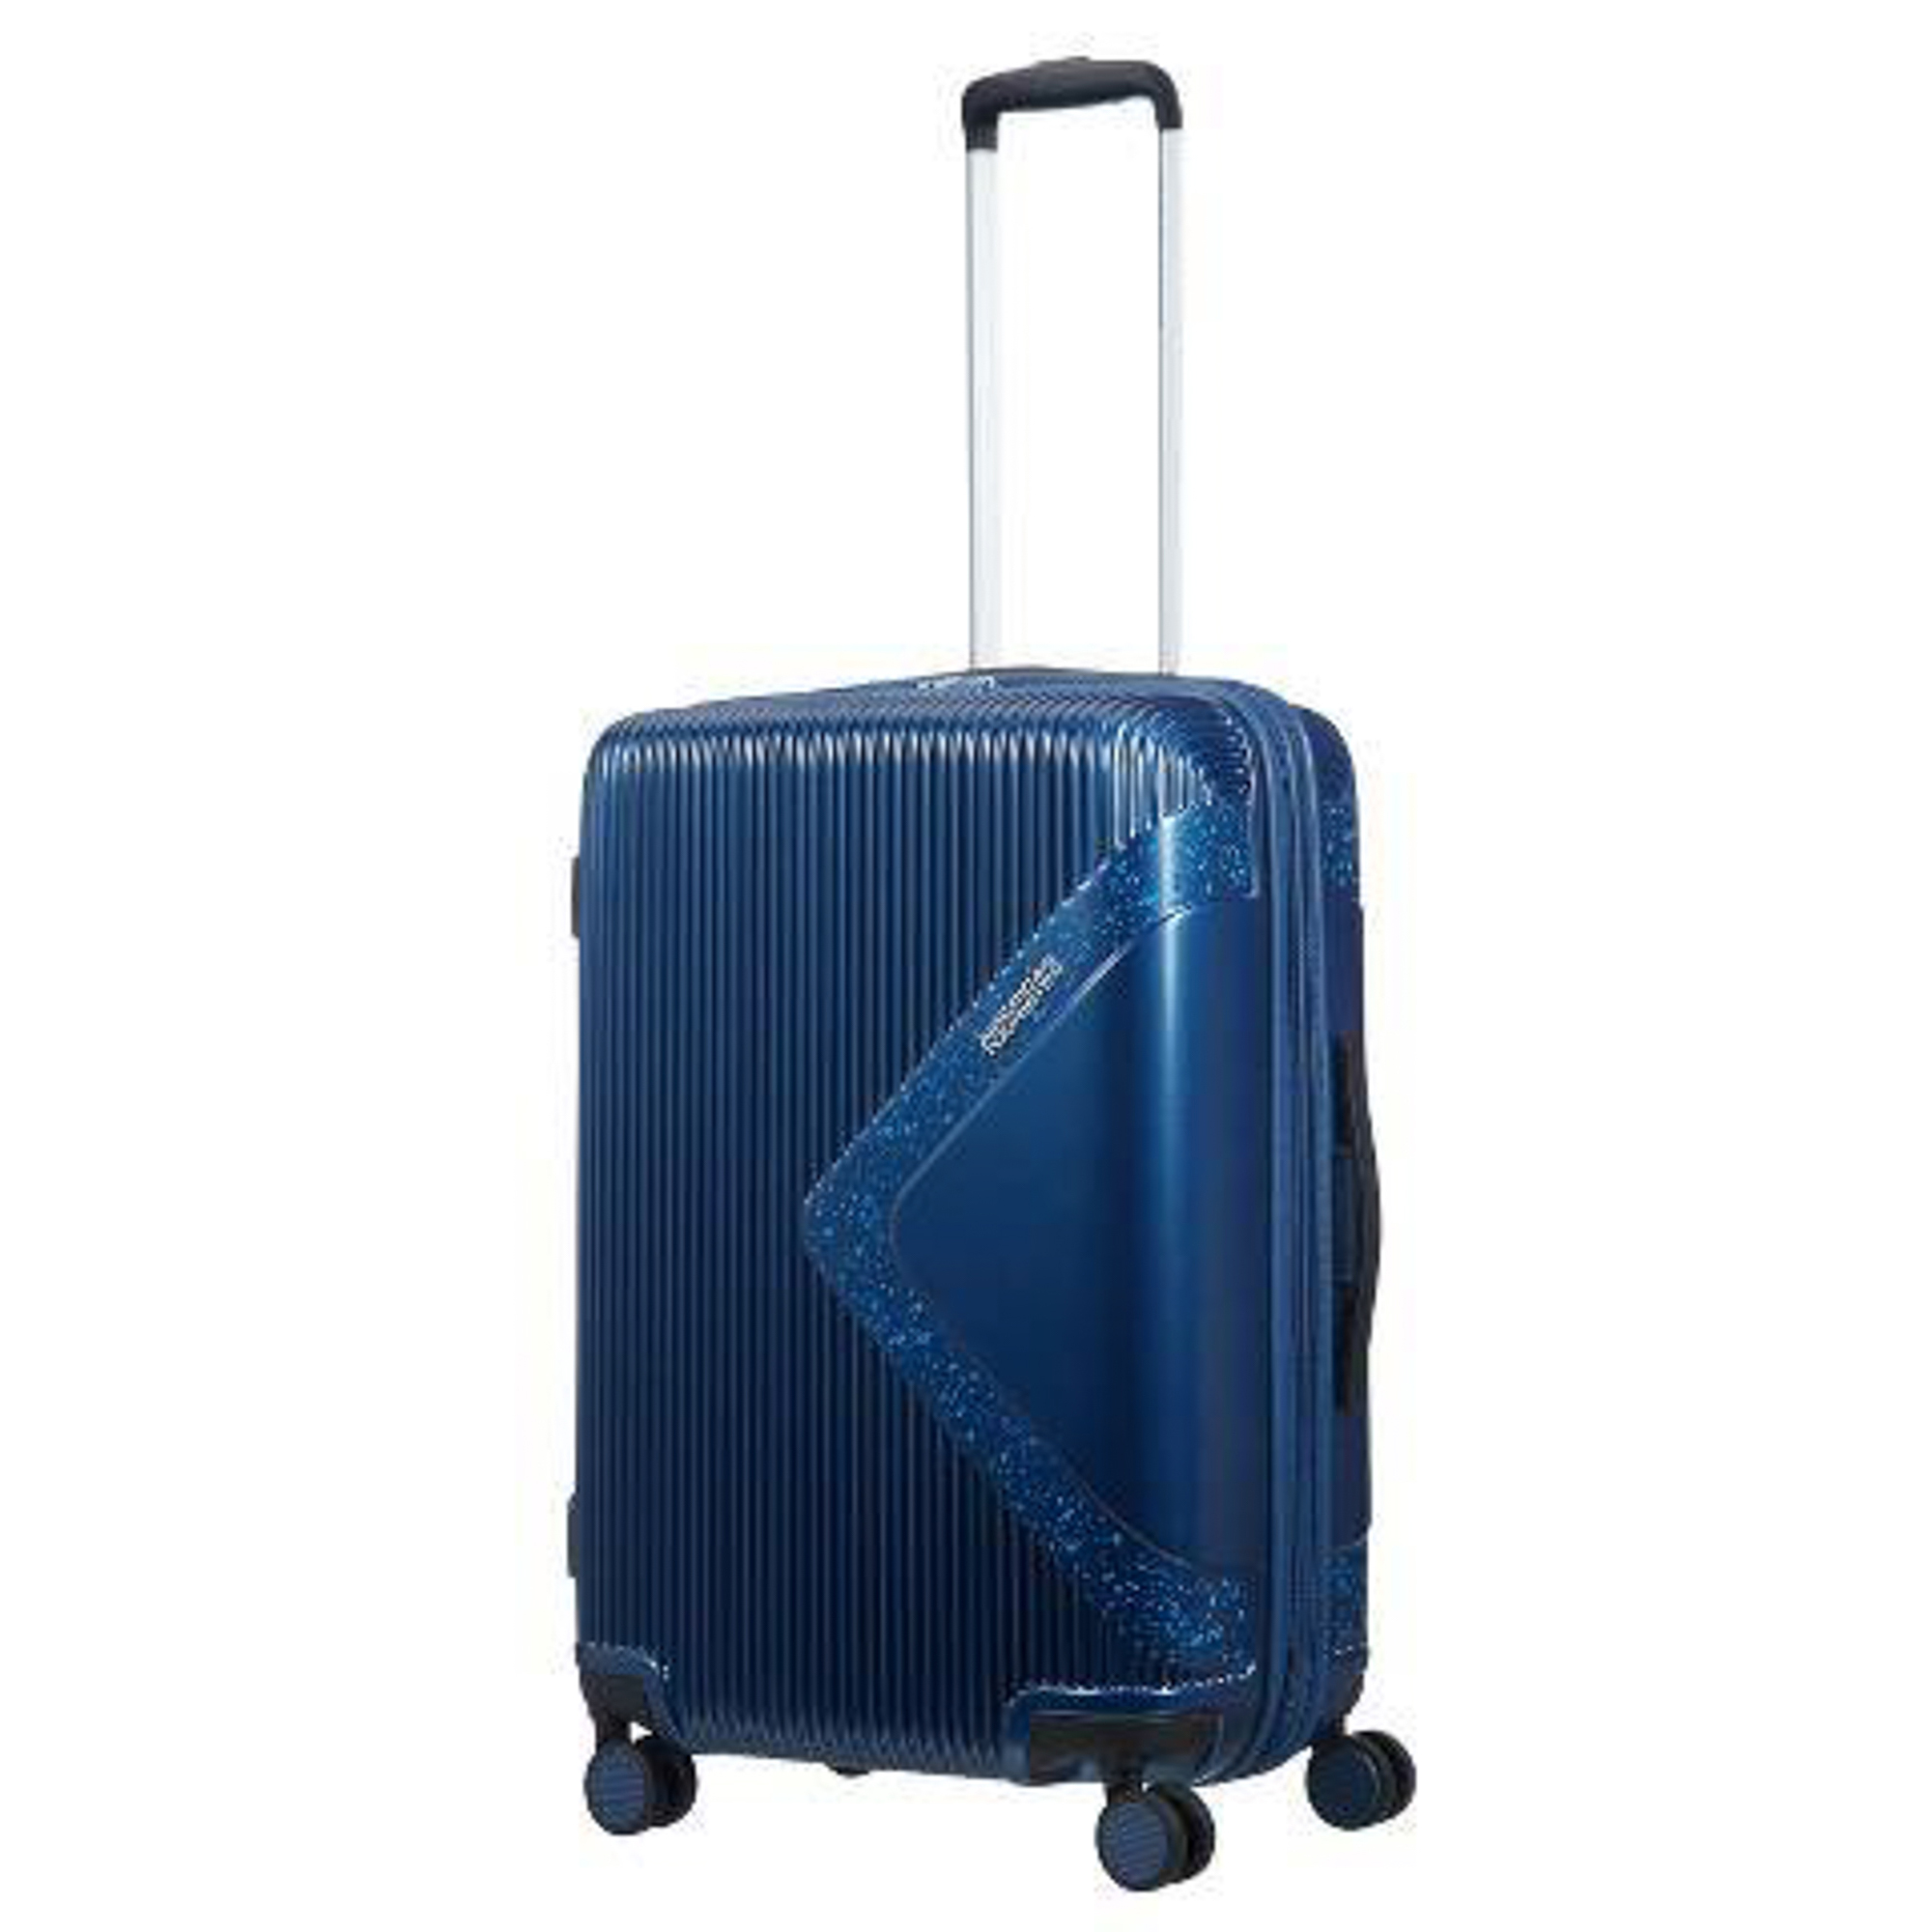 Чемодан American Tourister Modern dream синий с блеском M.